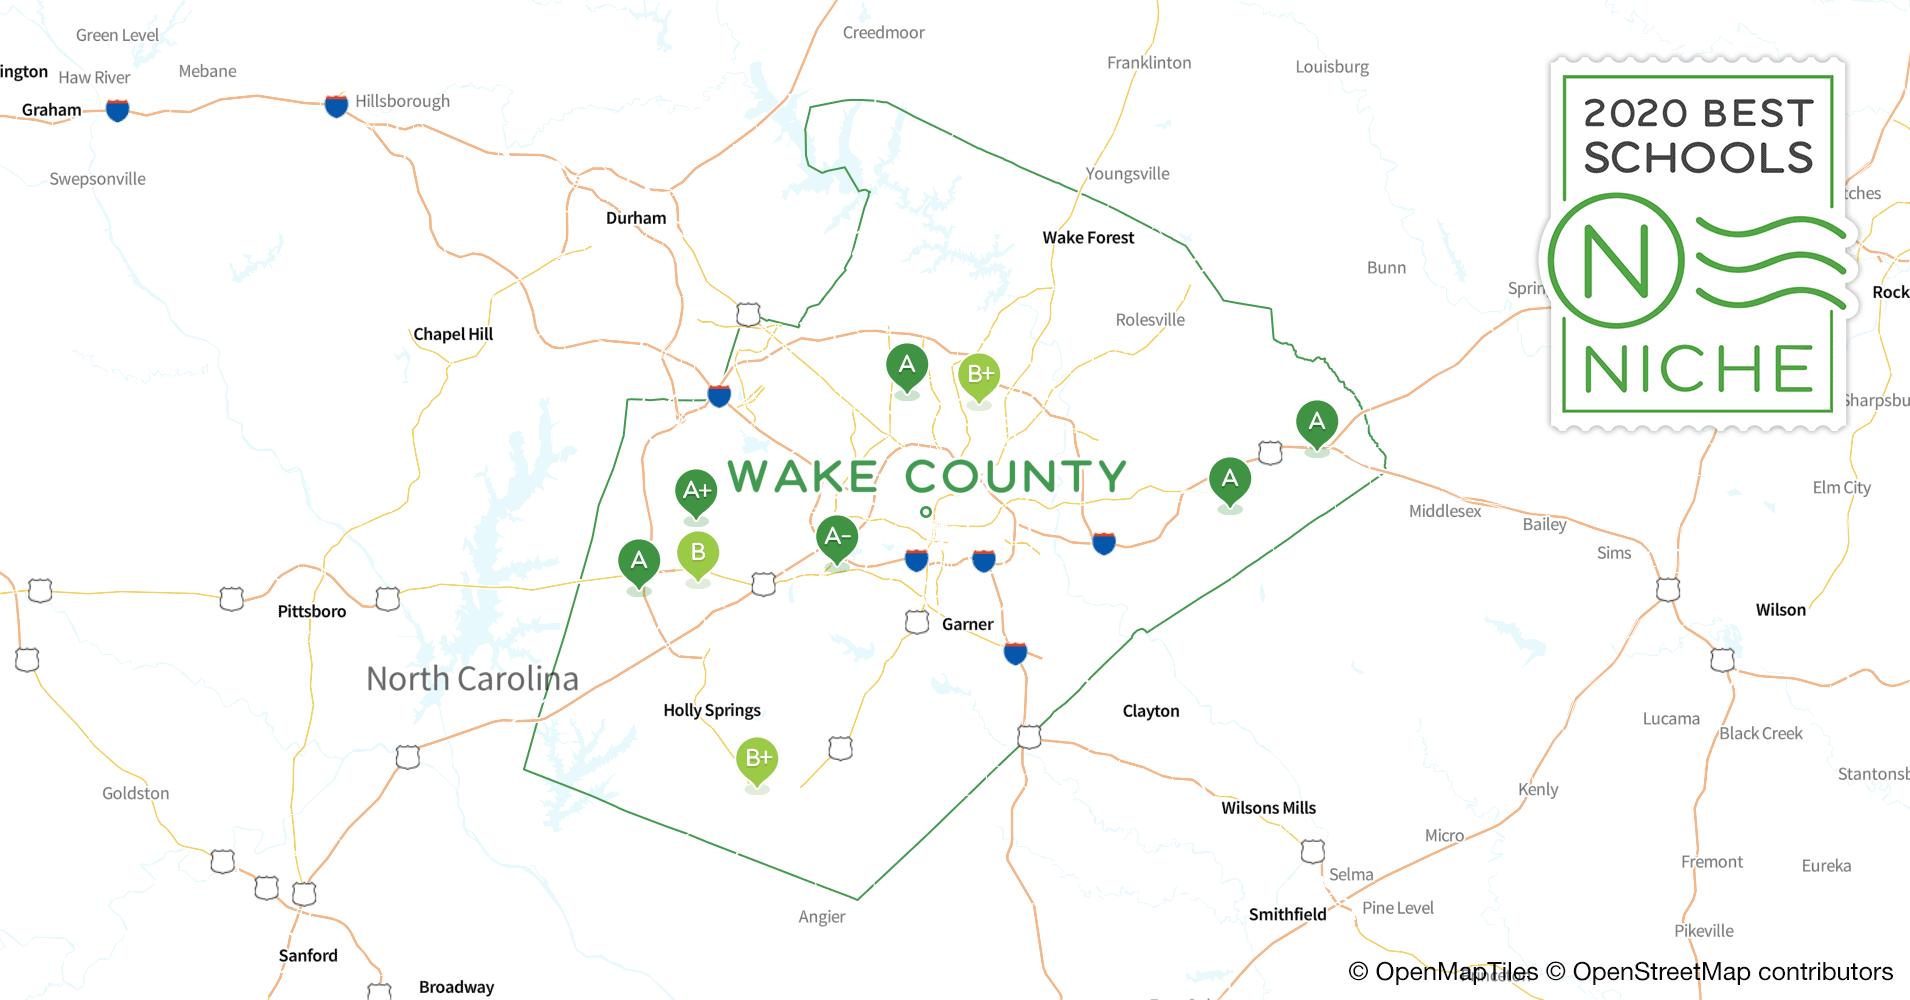 2020 Best Public Elementary Schools In Wake County, Nc - Niche Regarding List Of Year Round School In Wake County